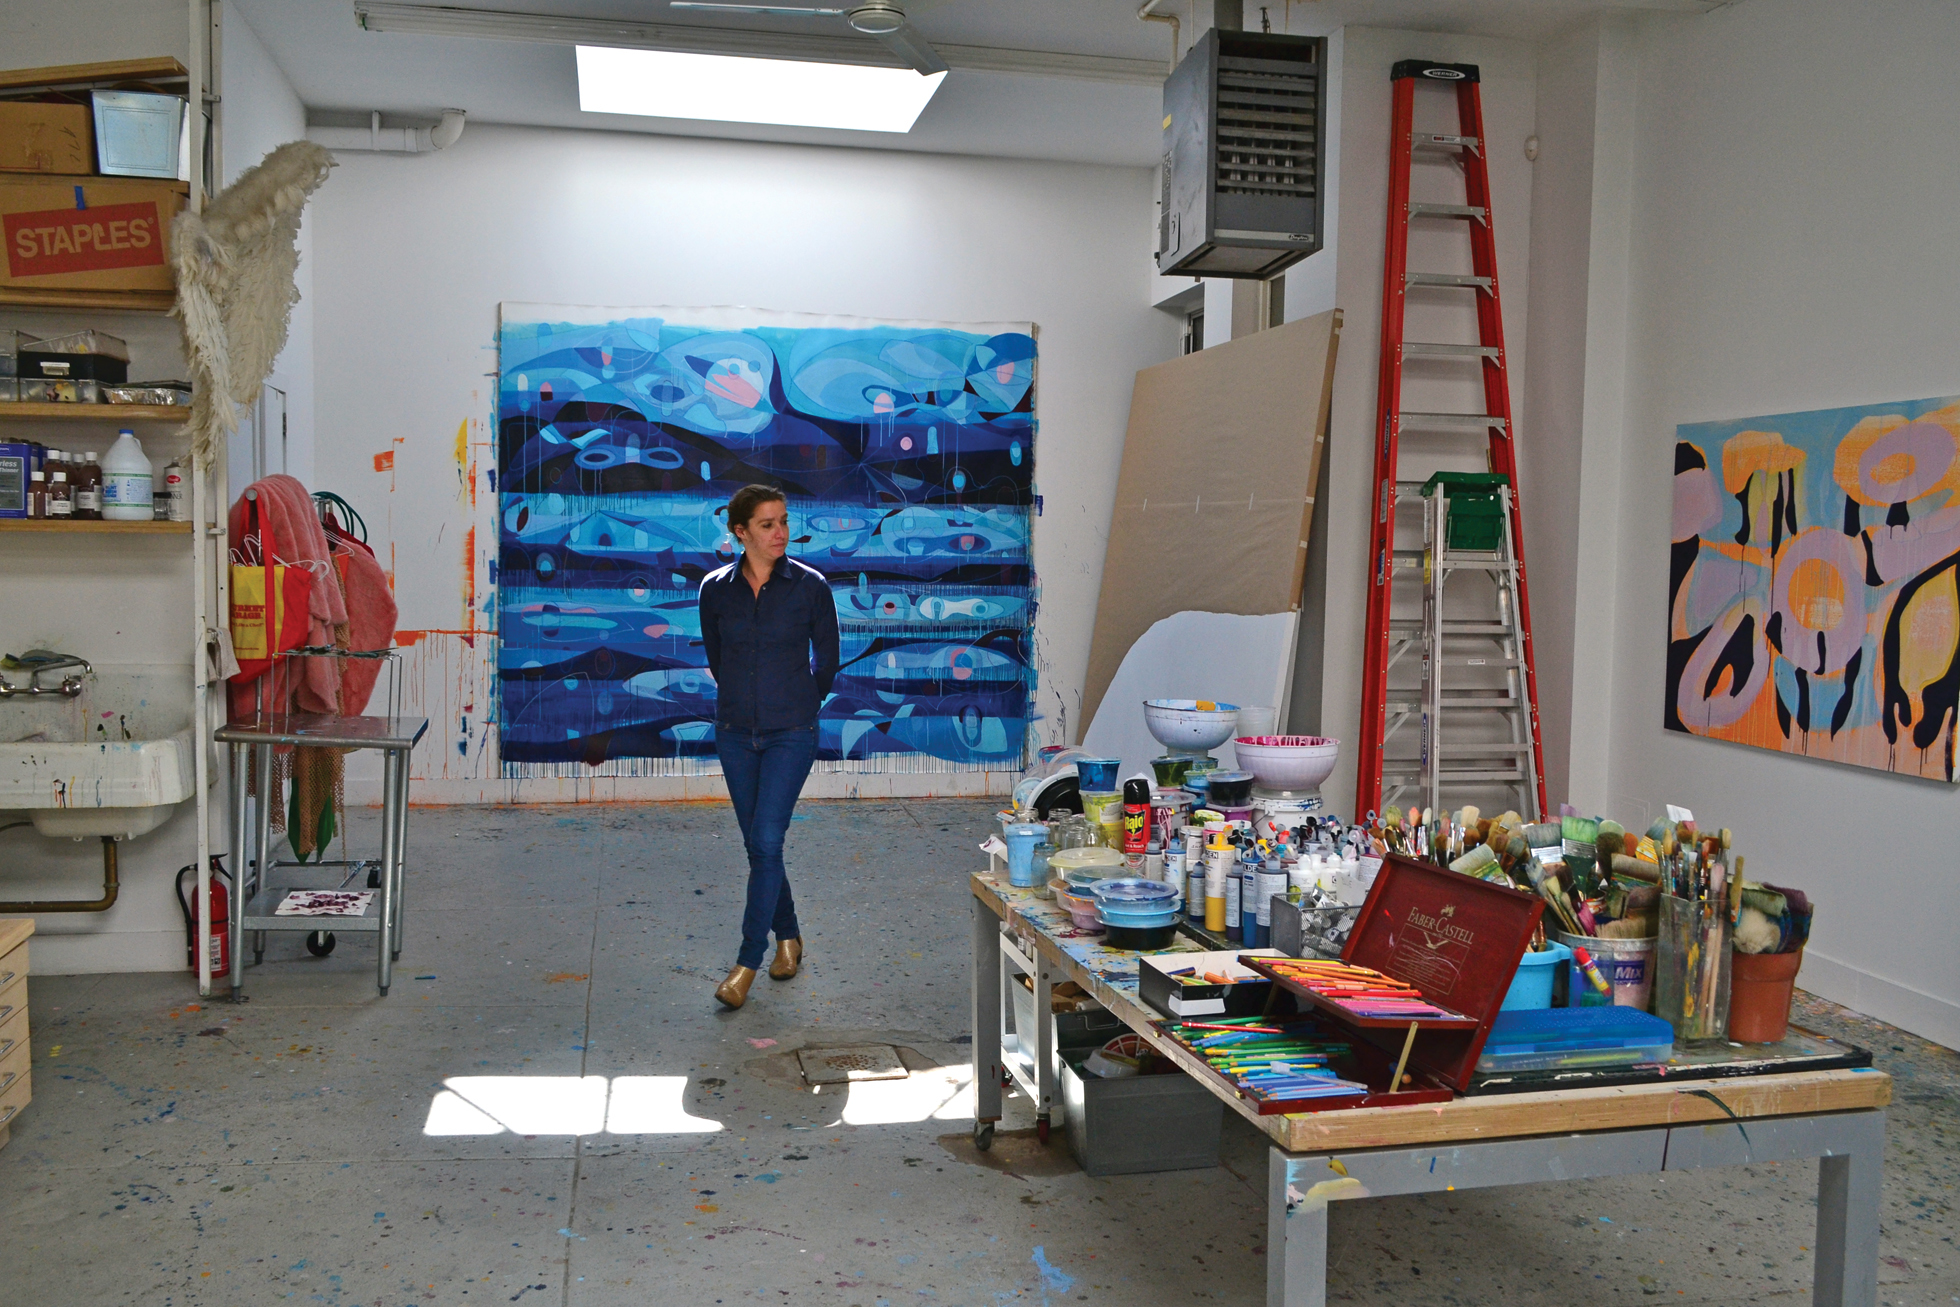 A woman walking through an art studio.